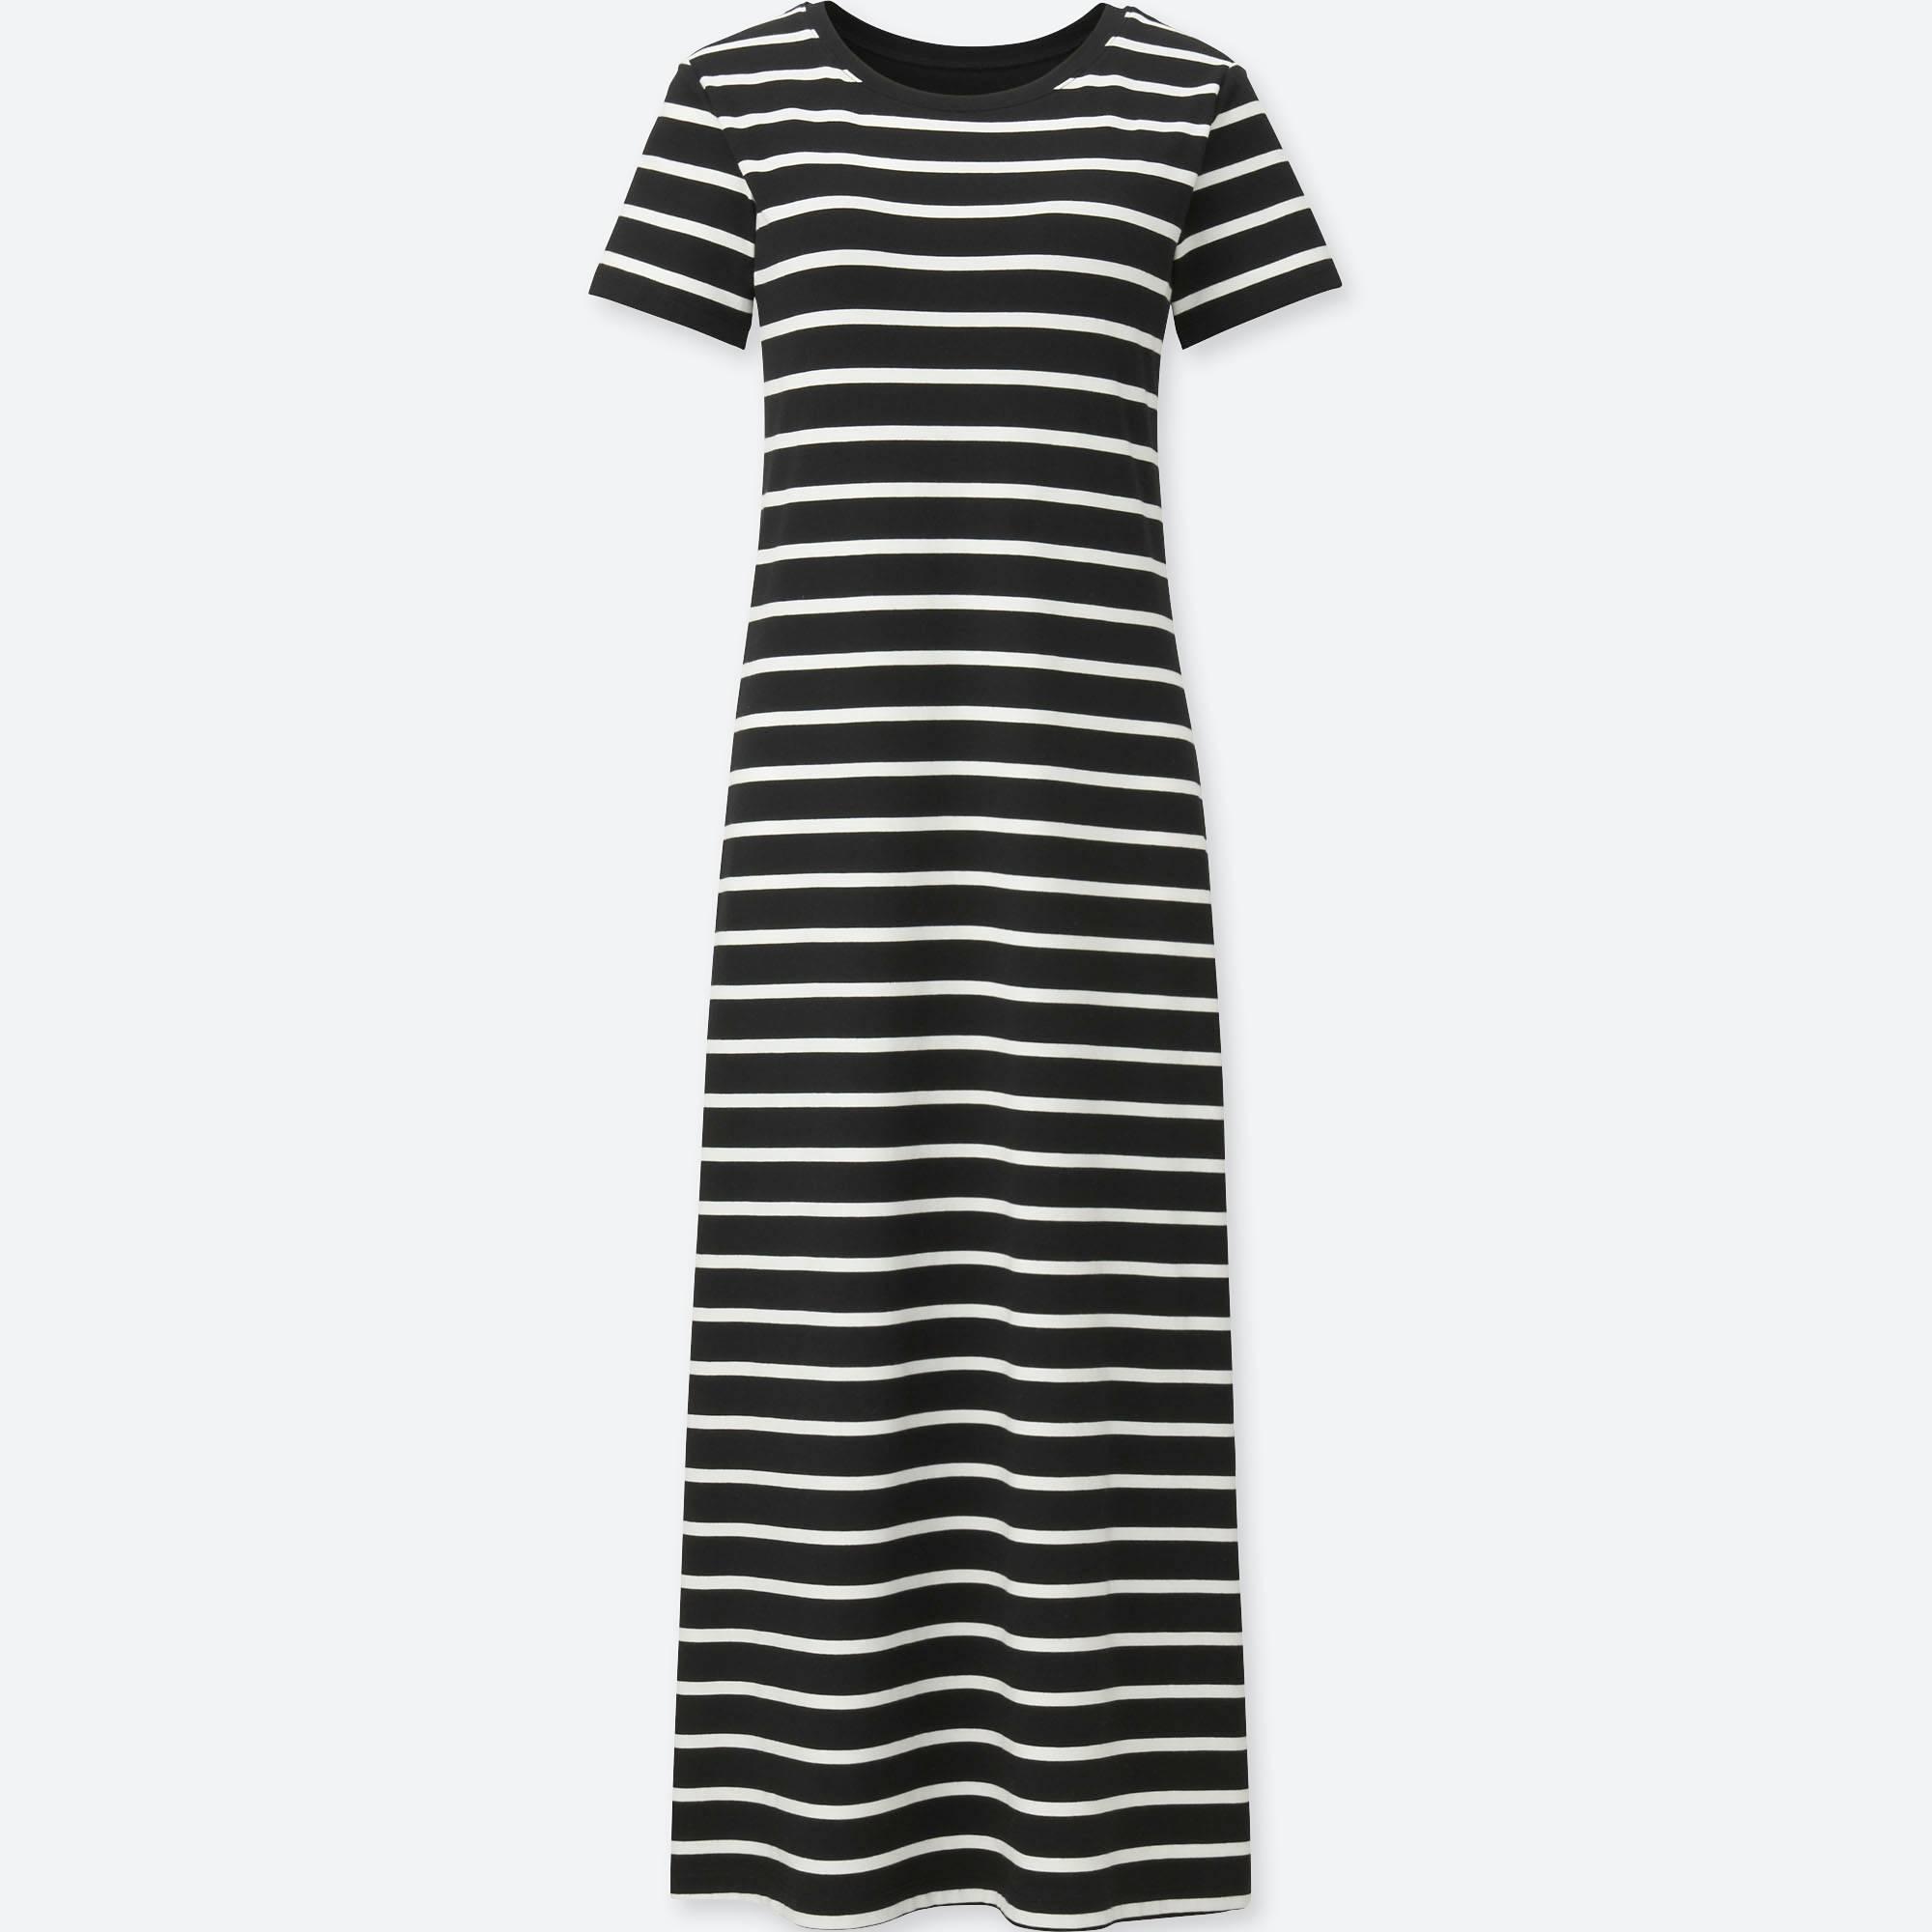 c98c201247312 Lyst - Uniqlo Striped Short Sleeve Maxi Bra Dress in Black